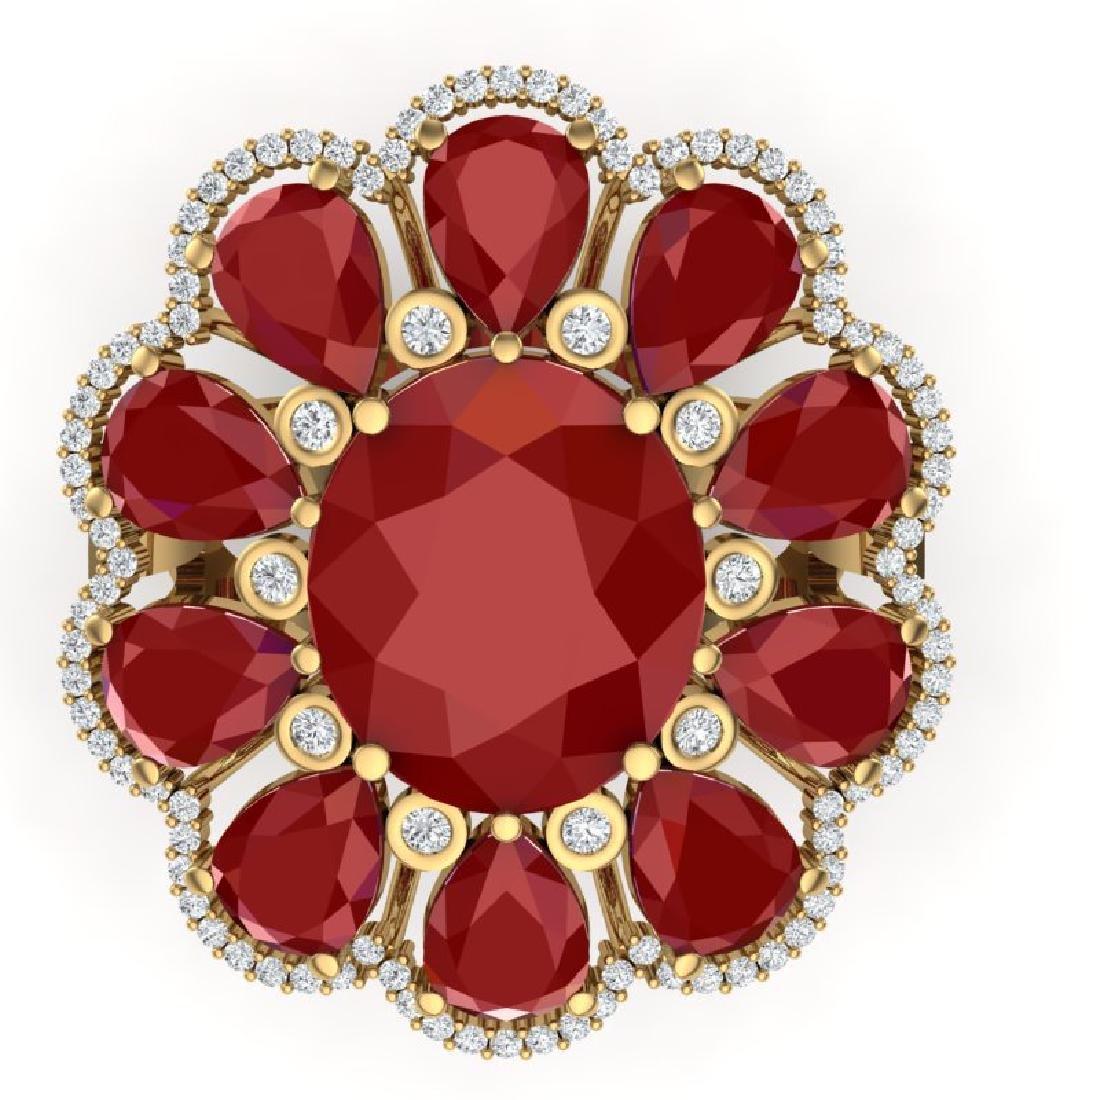 20.63 CTW Royalty Designer Ruby & VS Diamond Ring 18K - 2